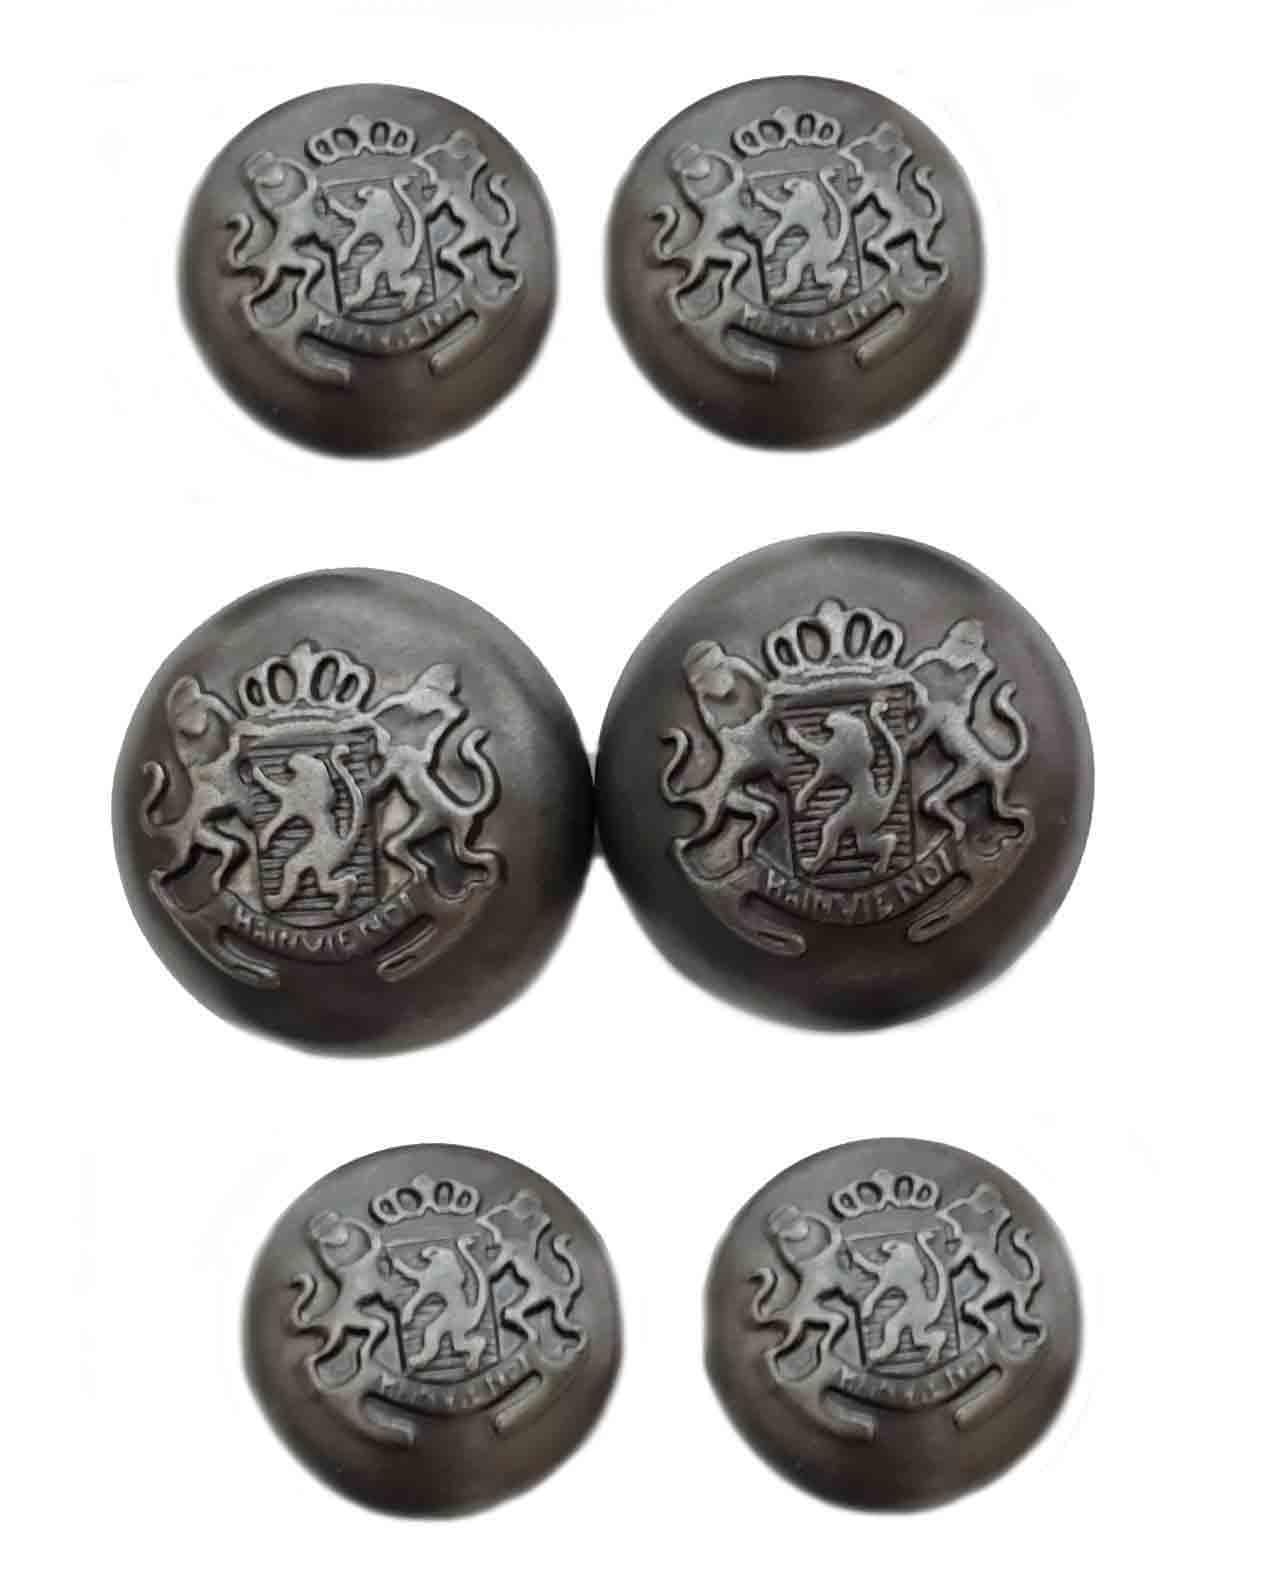 Vintage Forecaster Jacket Coat Dome Blazer Buttons Gray Metal Crown Lions Shield Men's